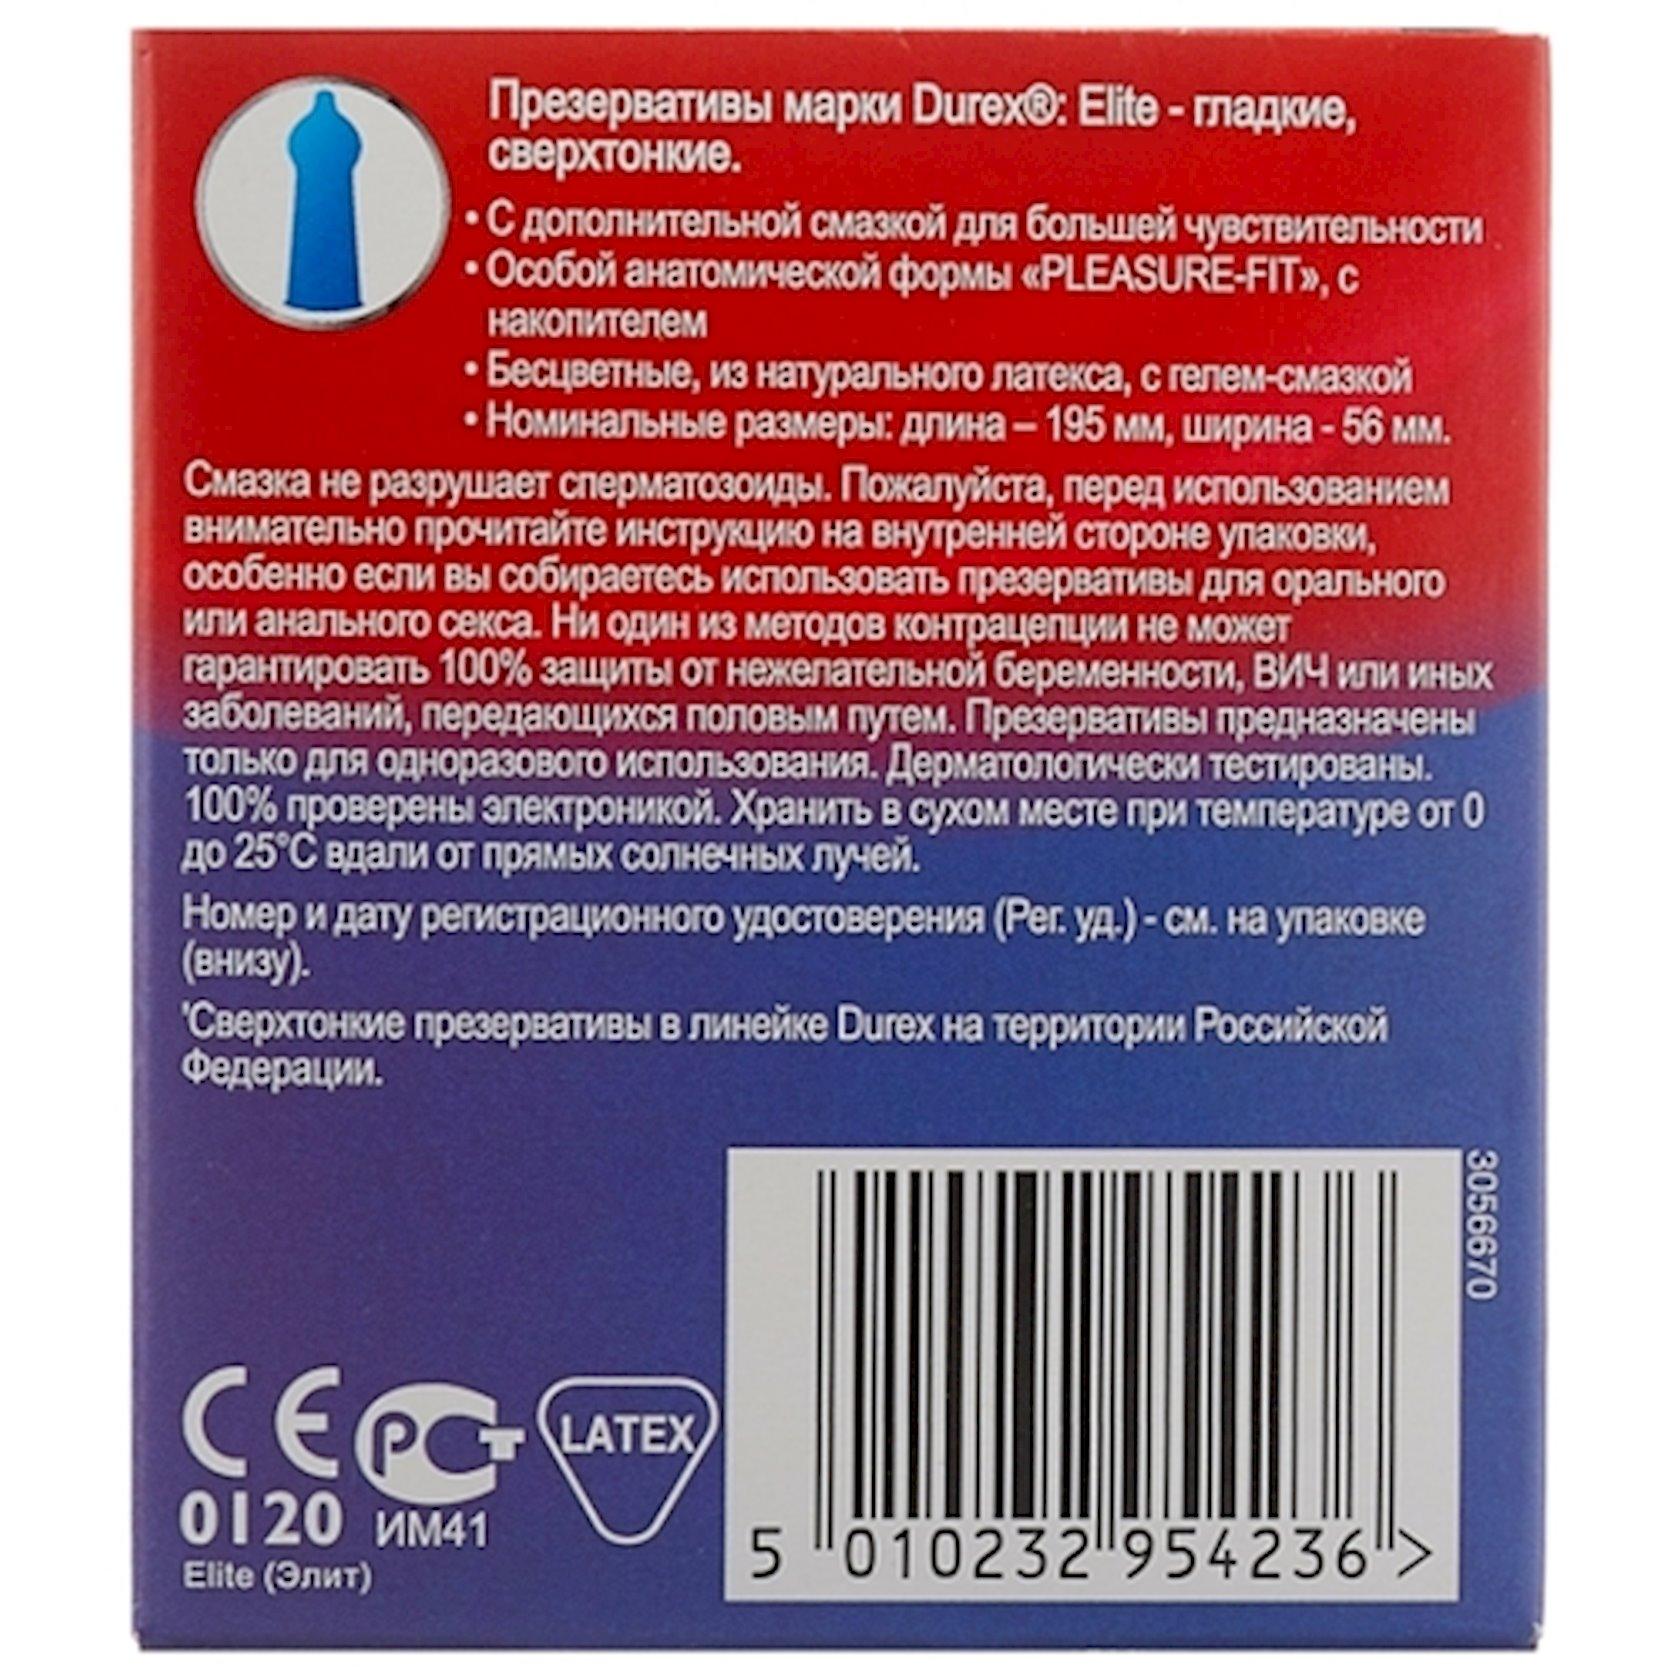 Prezervativlər Durex Elite 3 ədəd